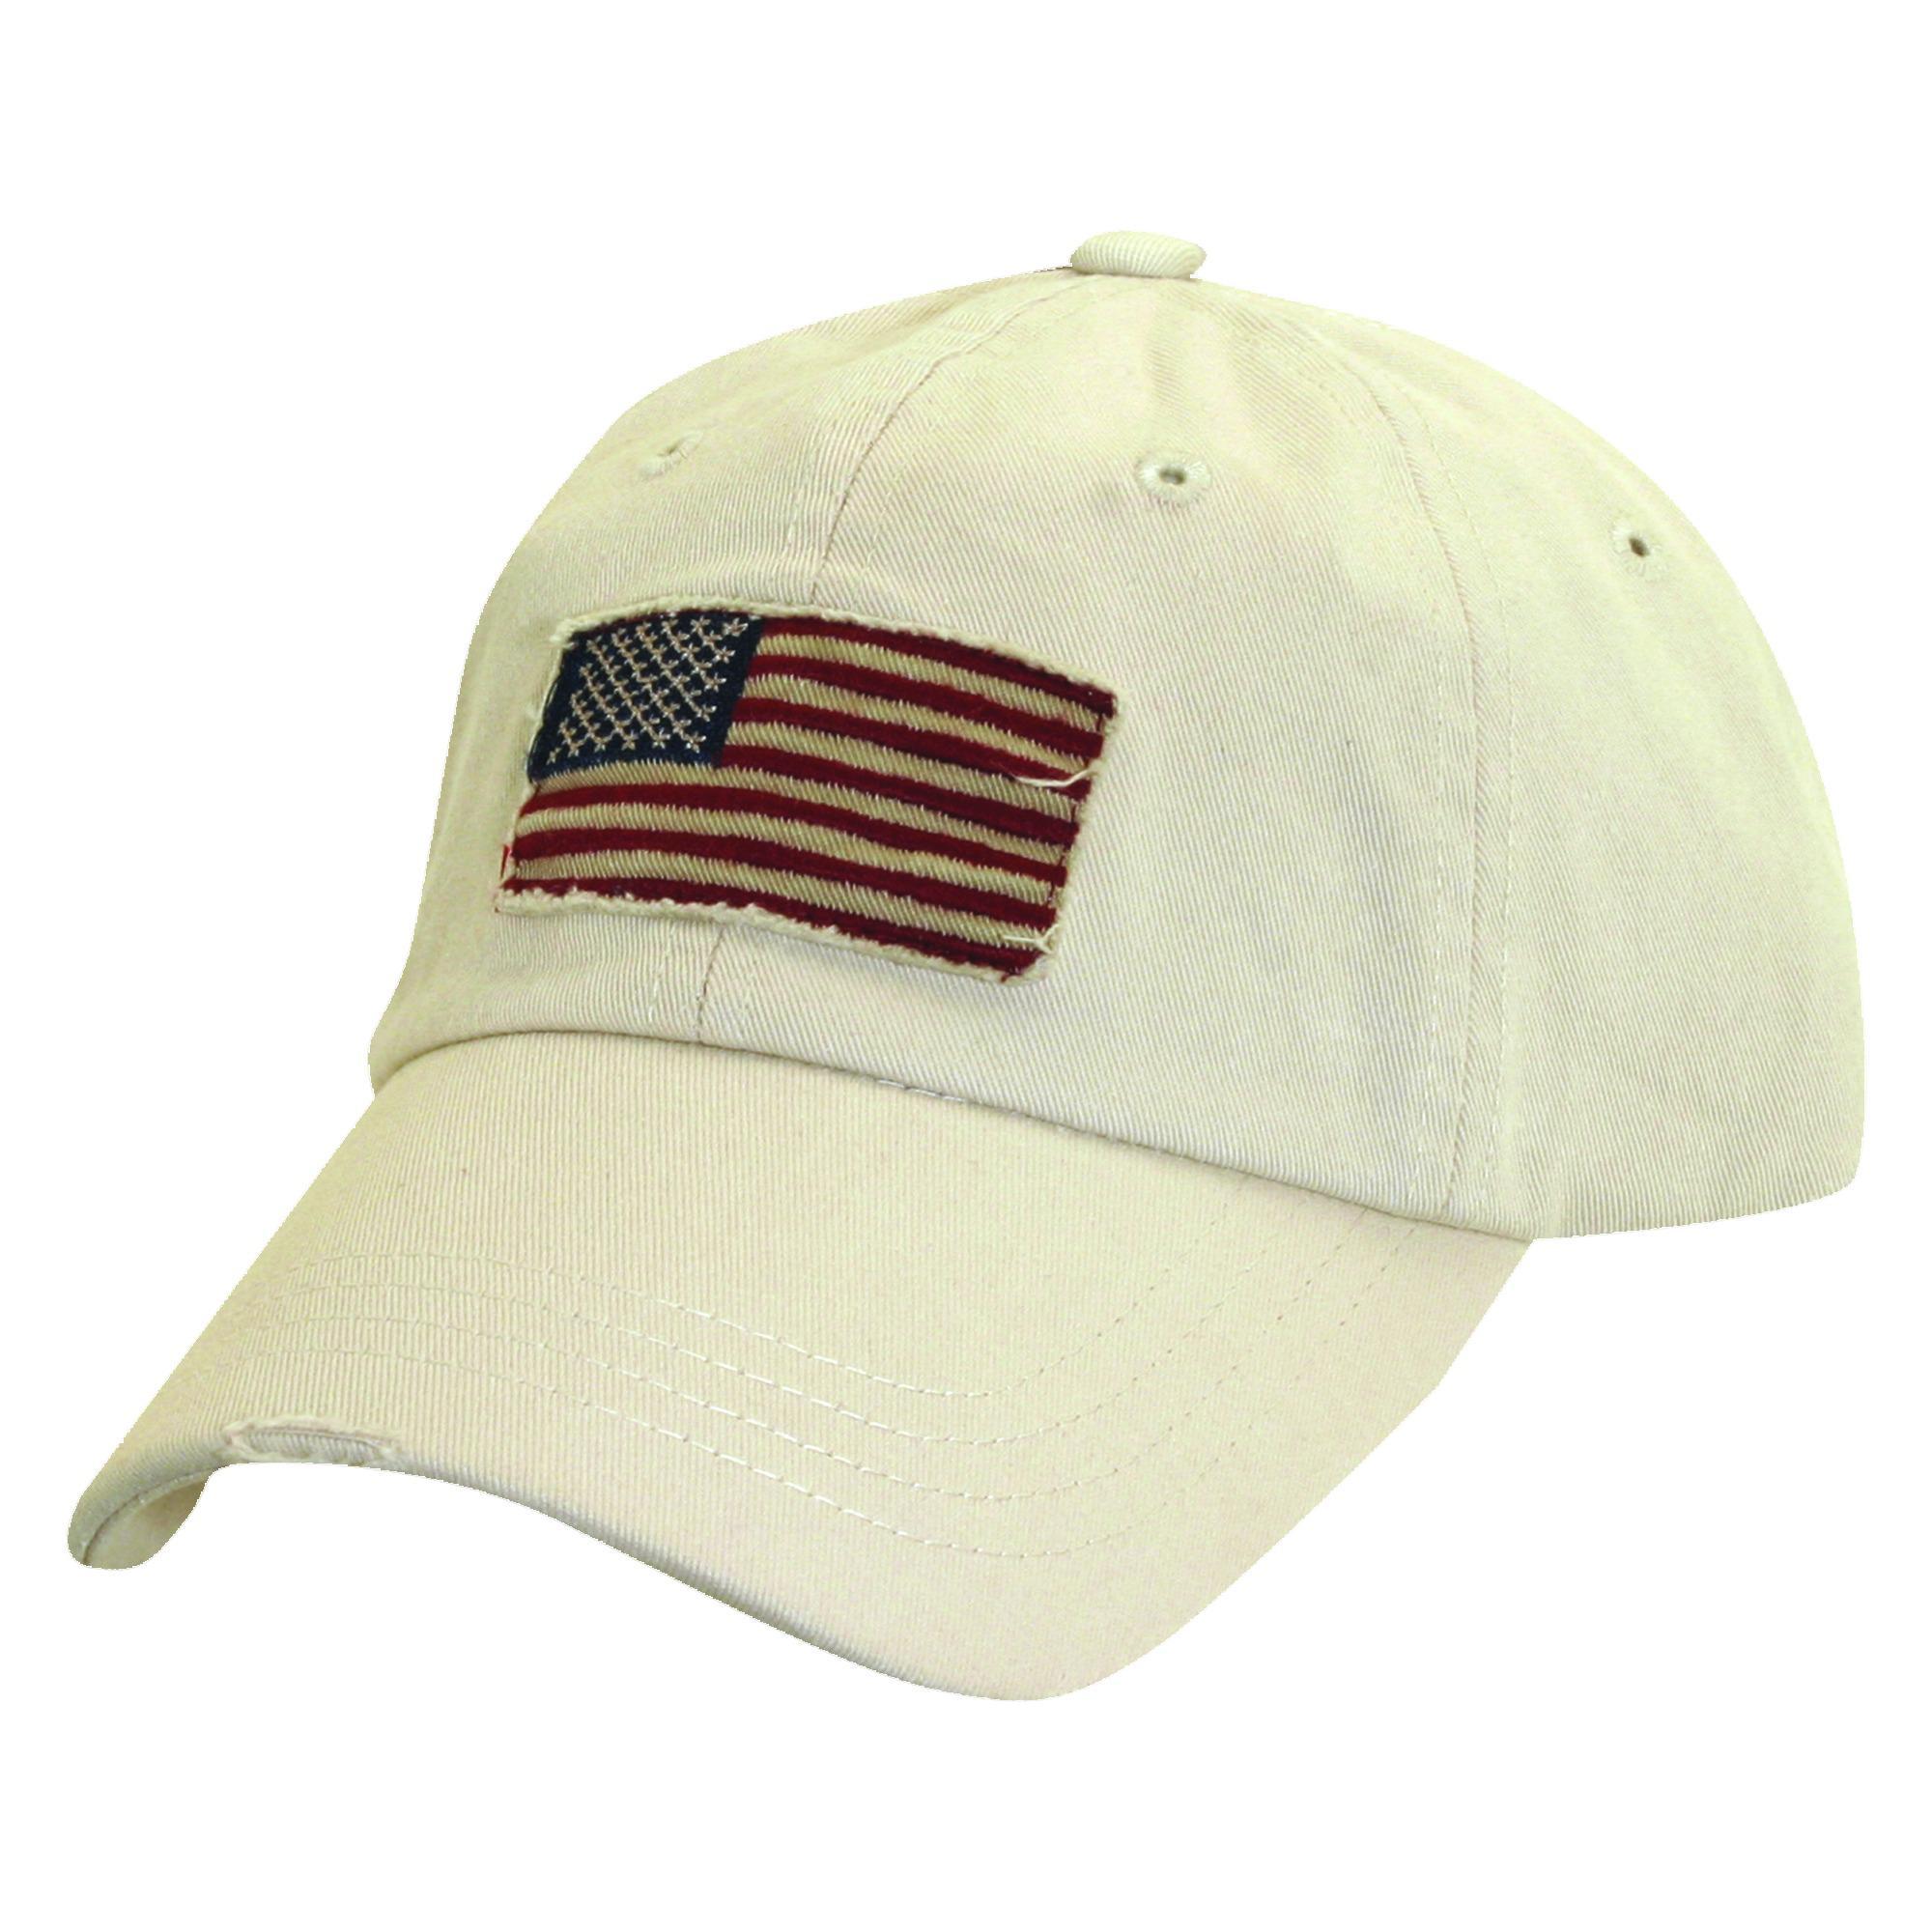 new dorfman pacific cotton american flag summer baseball